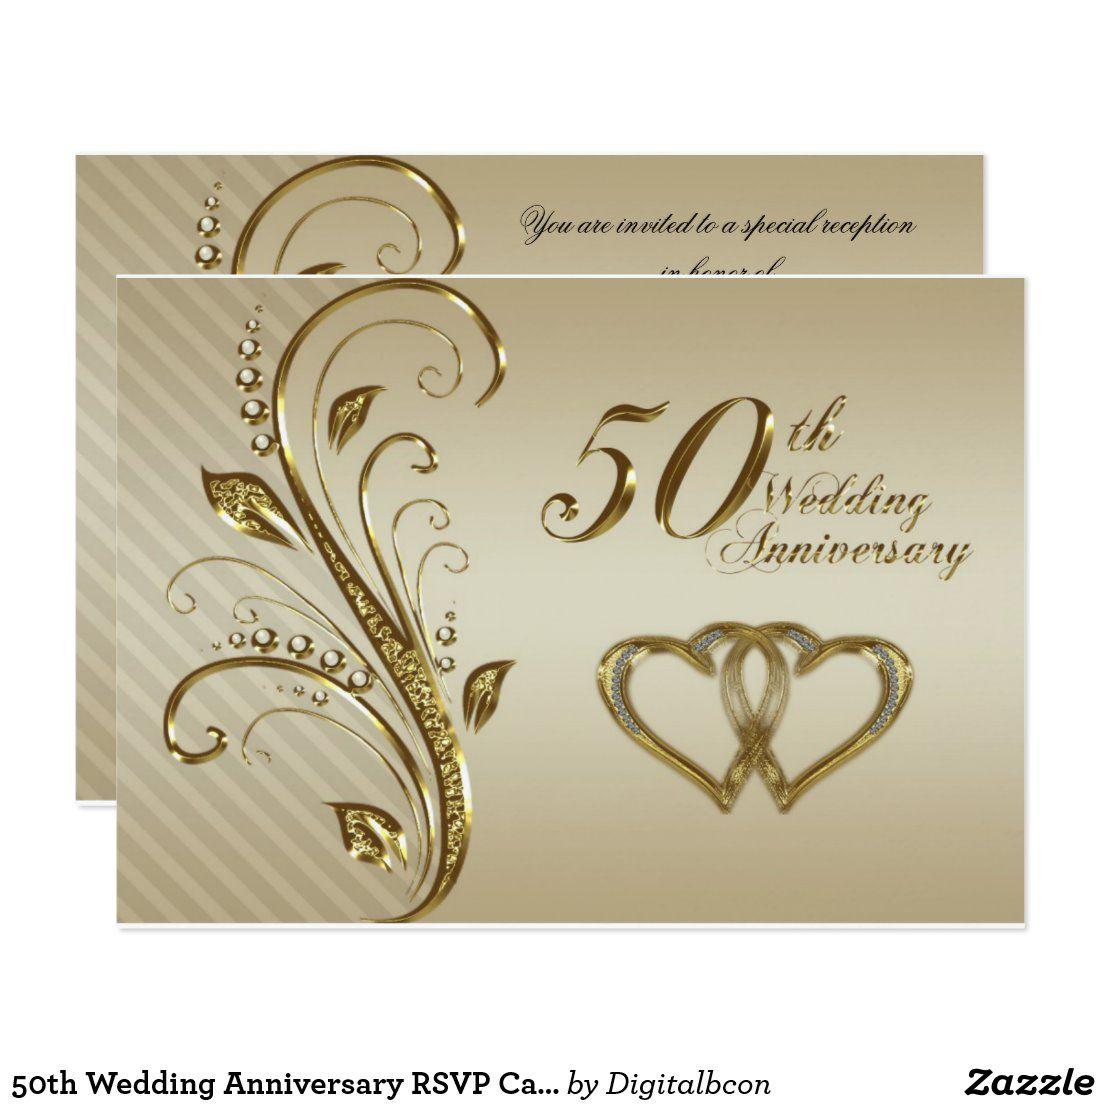 50th Wedding Anniversary Rsvp Card Zazzle Com In 2020 50th Anniversary Invitations 50th Wedding Anniversary Invitations Golden Wedding Anniversary Invitations